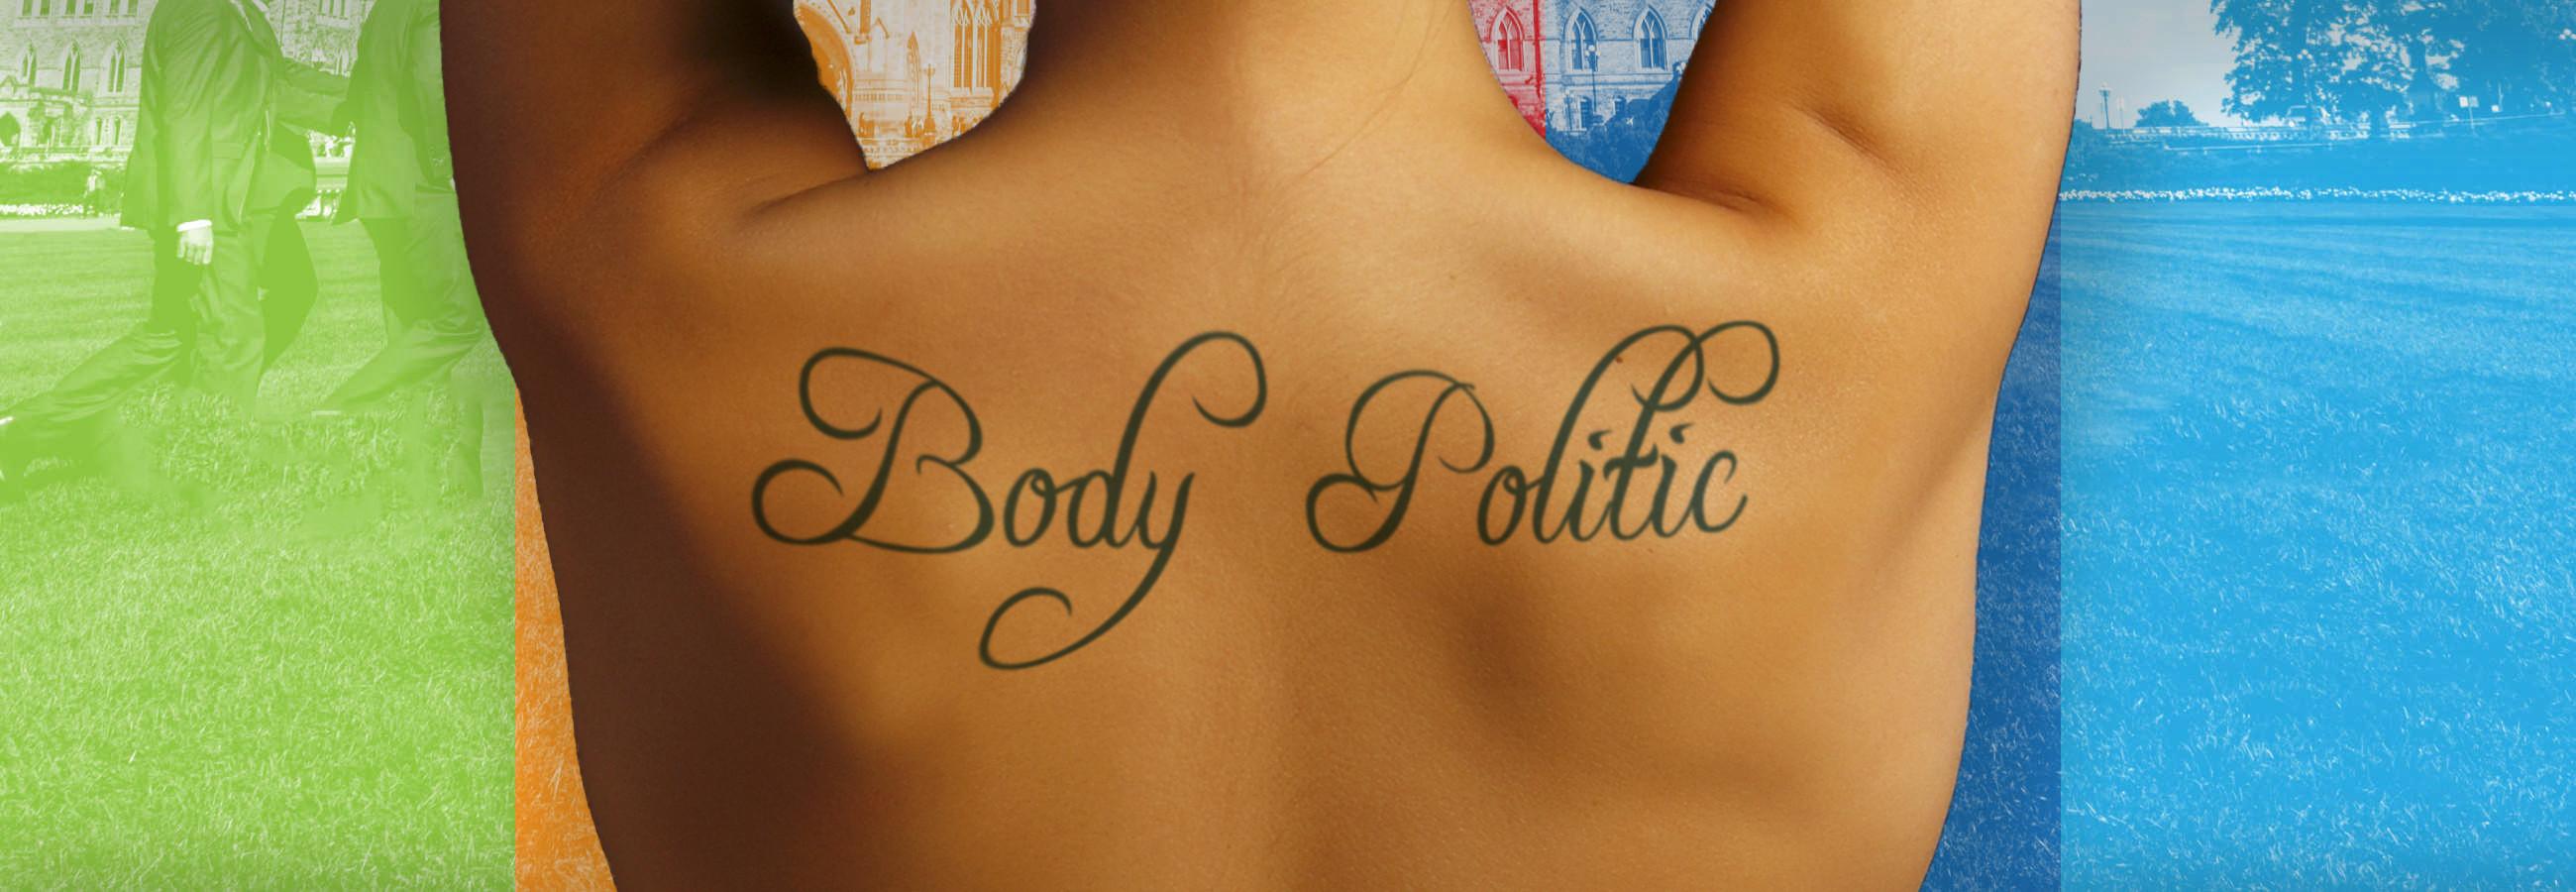 the-body-politic.jpg